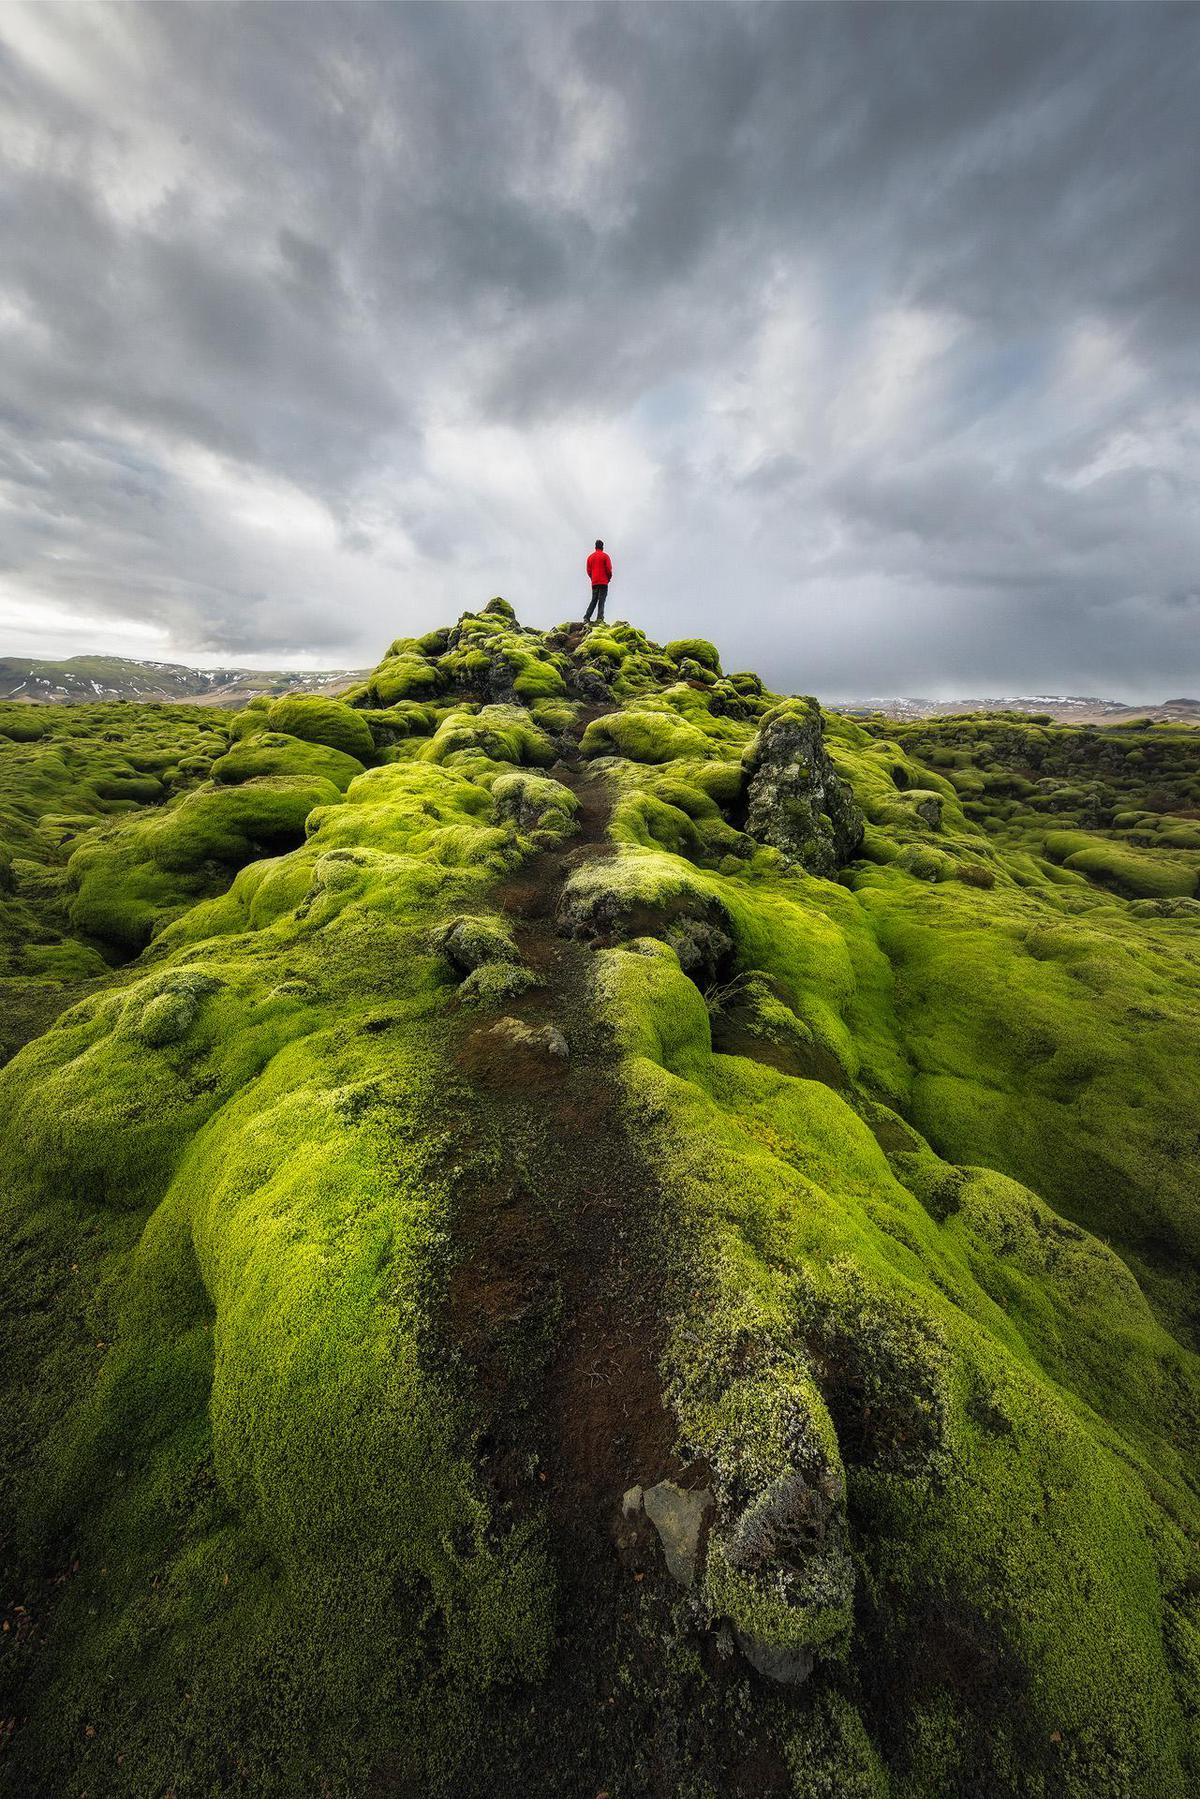 Image of Highland, Nature, Green, Sky, Grass, Fell etc.